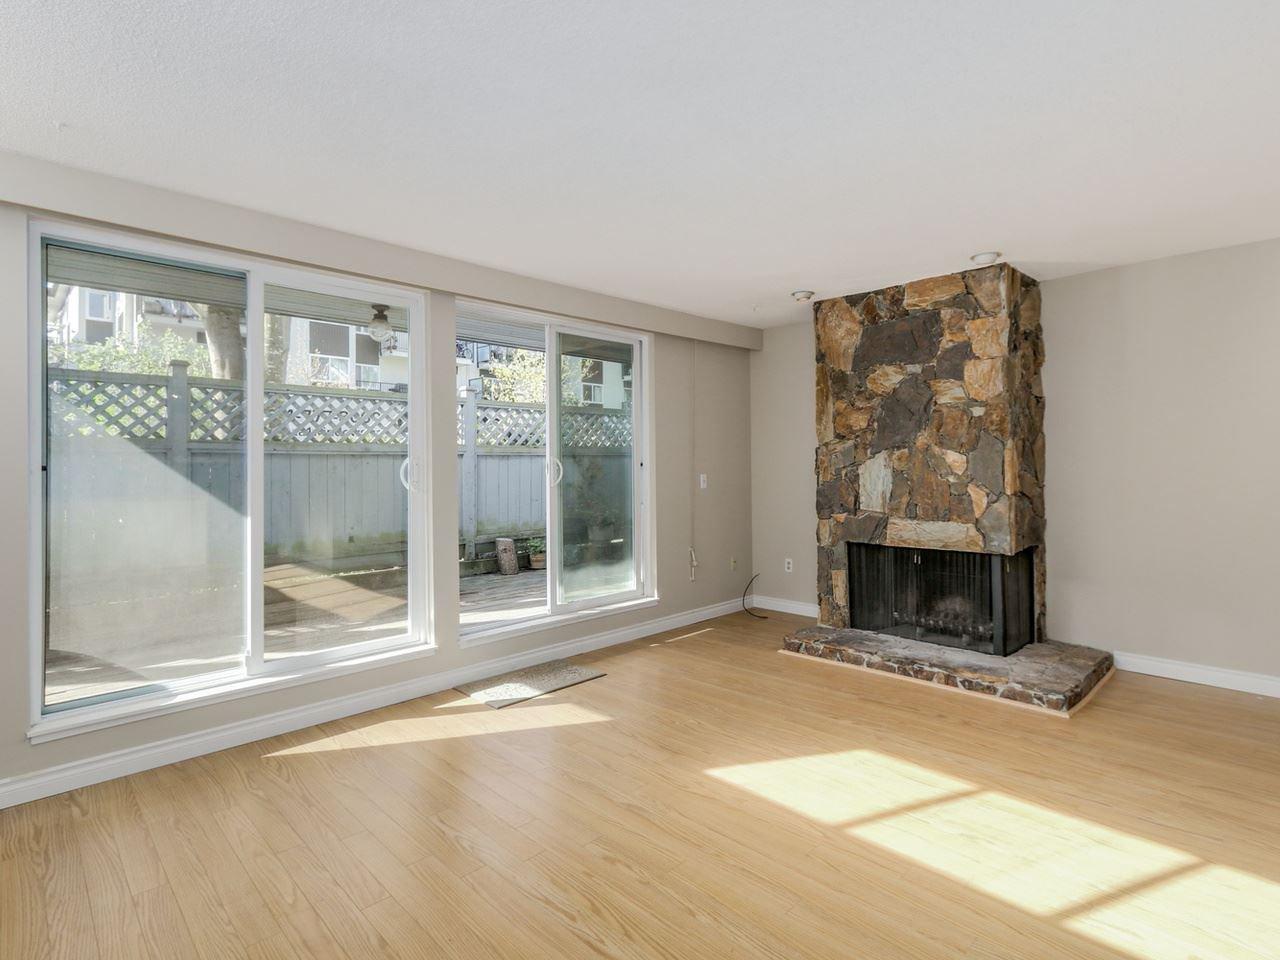 "Photo 6: Photos: 115 2125 YORK Avenue in Vancouver: Kitsilano Condo for sale in ""YORK GARDENS"" (Vancouver West)  : MLS®# R2054686"